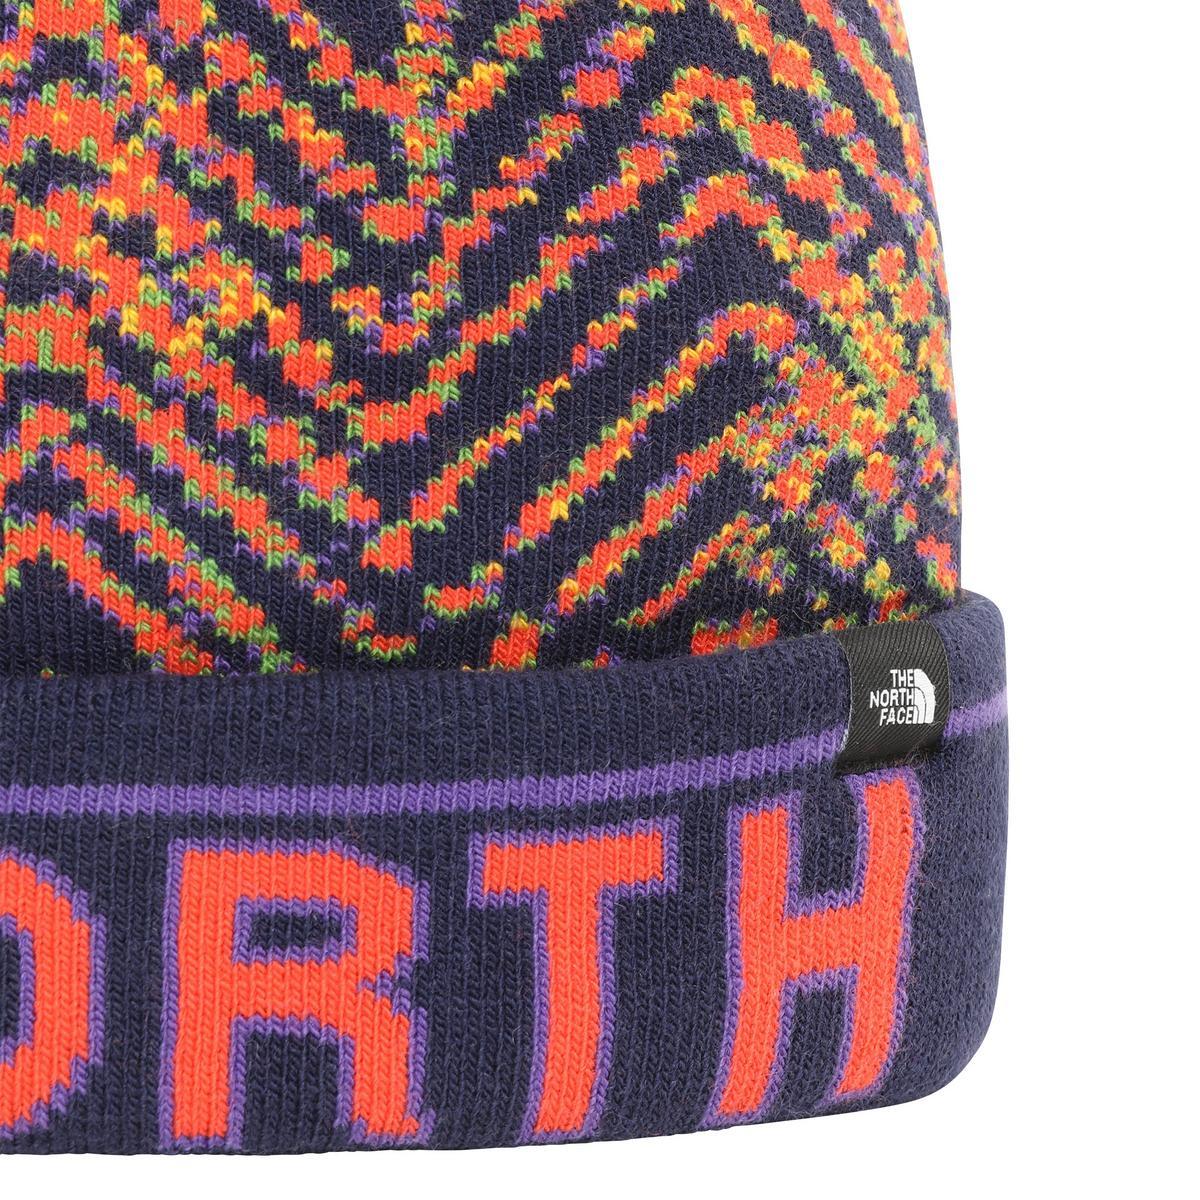 The North Face Kid's Ski Tuke - Navy Shibori Tie-Dye Print